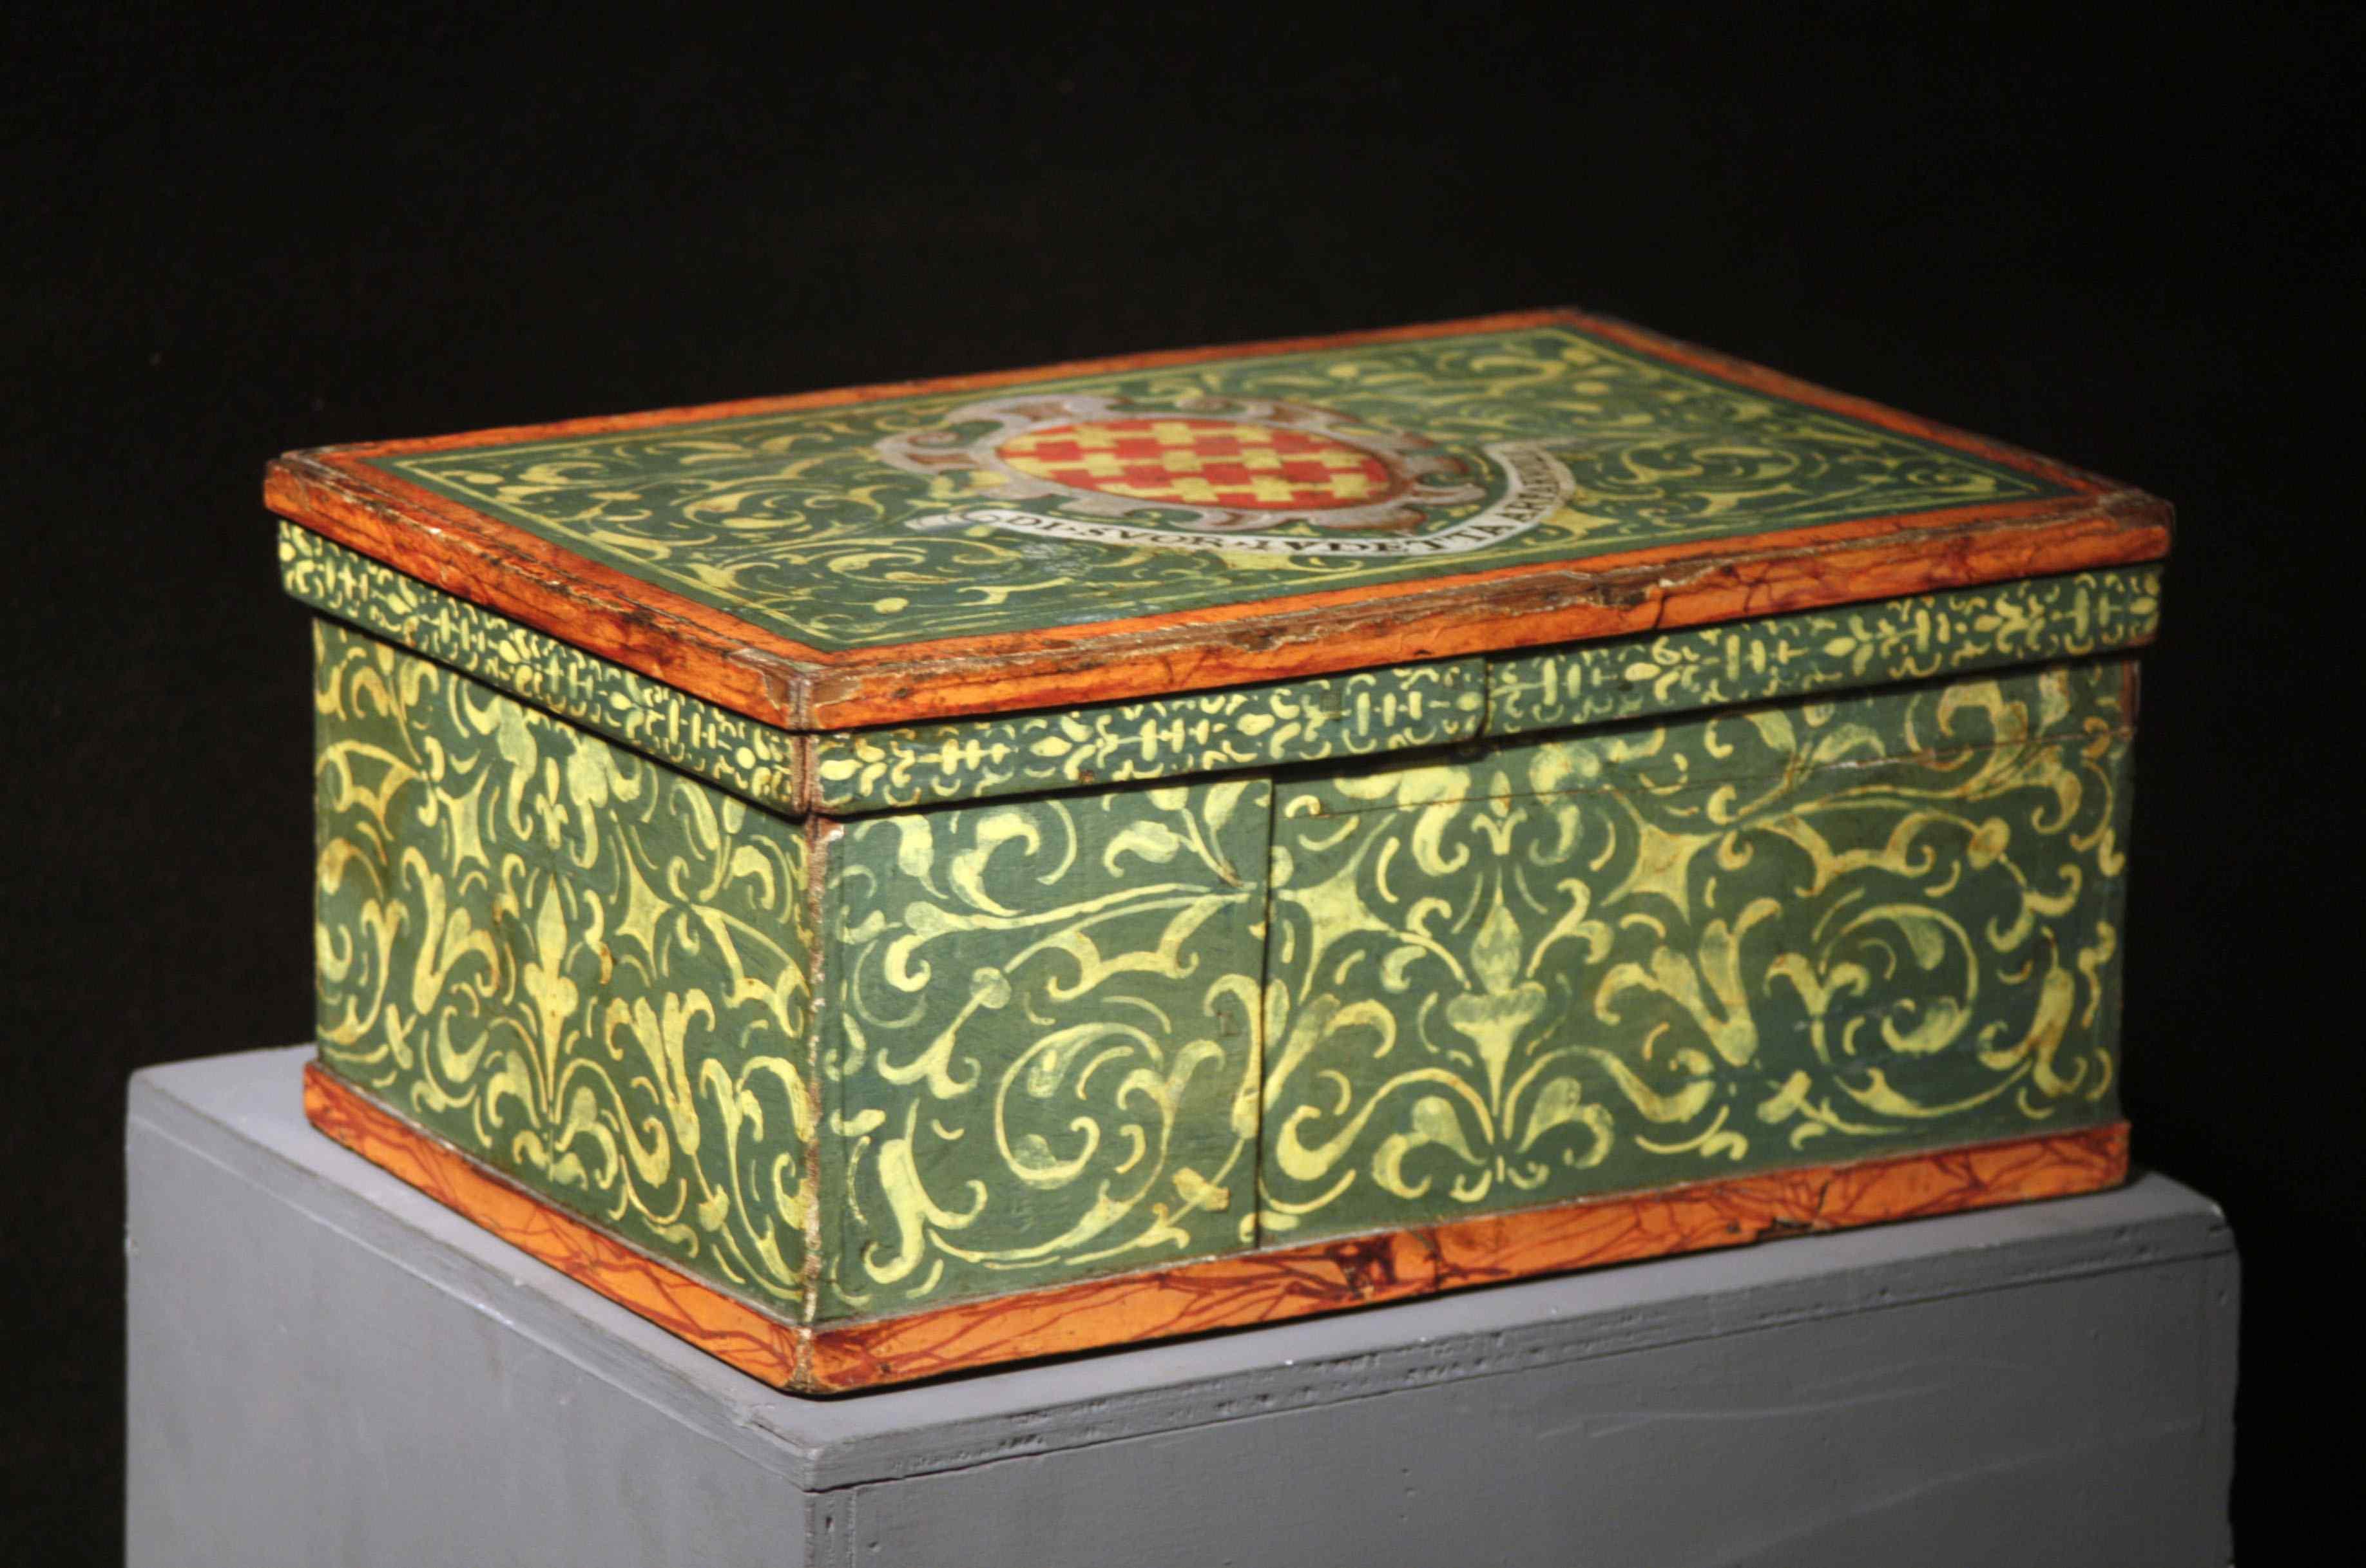 Lacquered box, Tuscany, 17th century